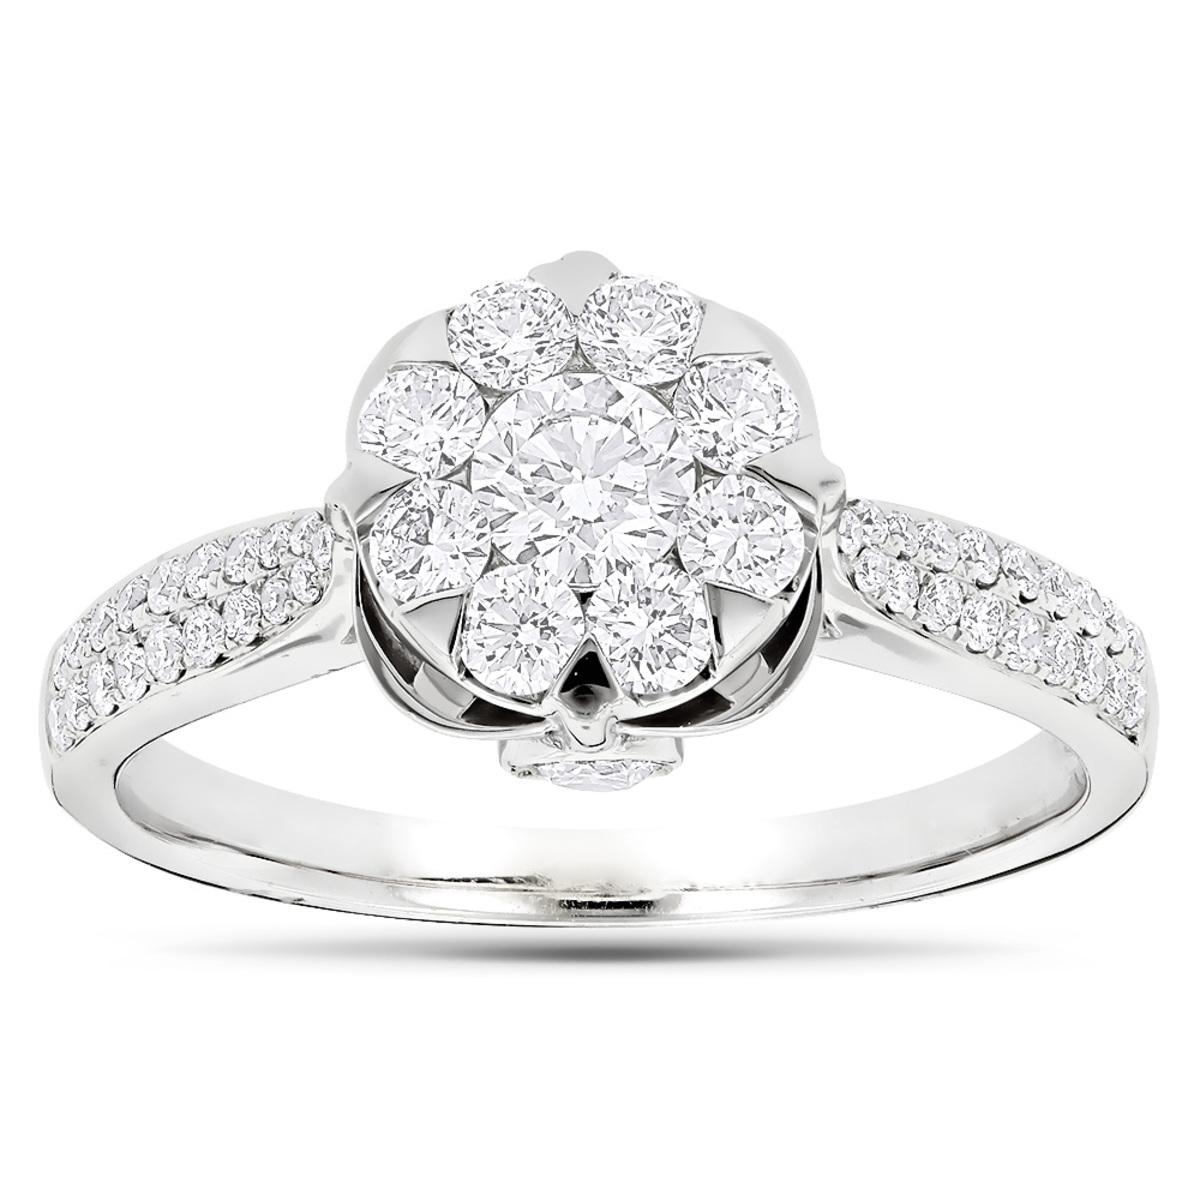 Designer Diamond Rings 18K Gold Luccello Engagement Ring 1.2ct